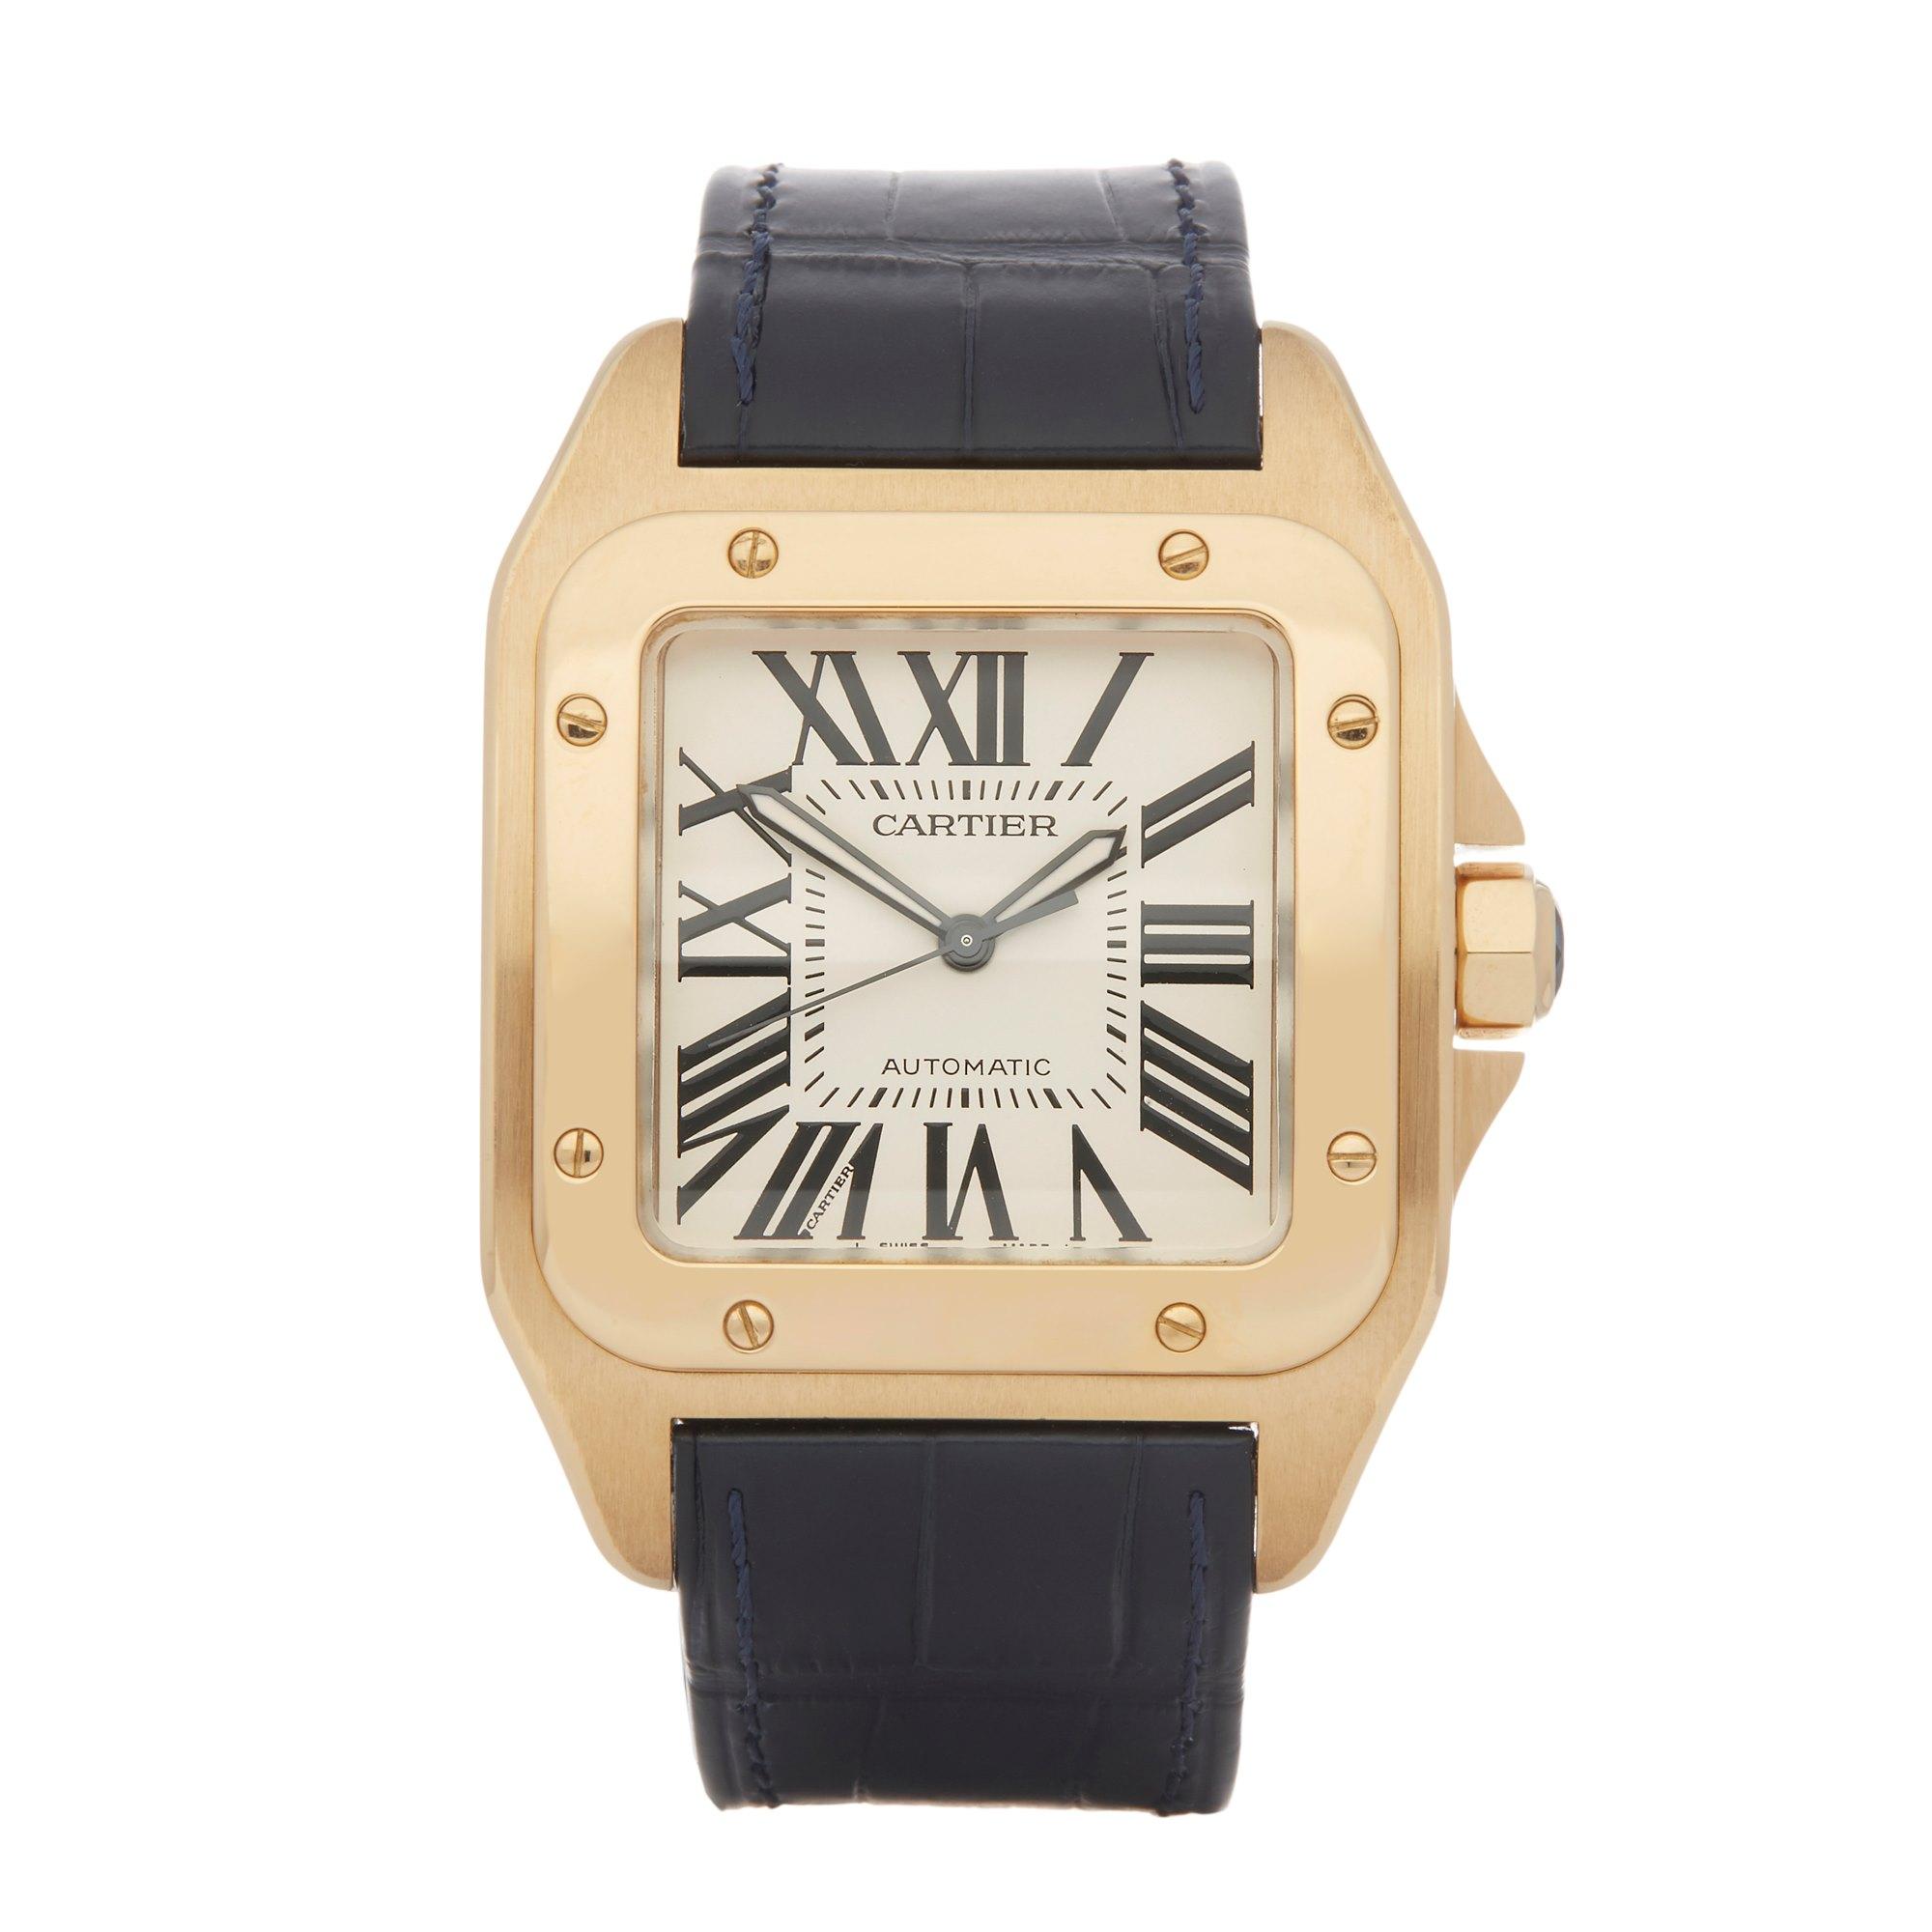 Cartier Santos 100 W20071Y1 or 2657 Men Yellow Gold Watch - Image 2 of 8